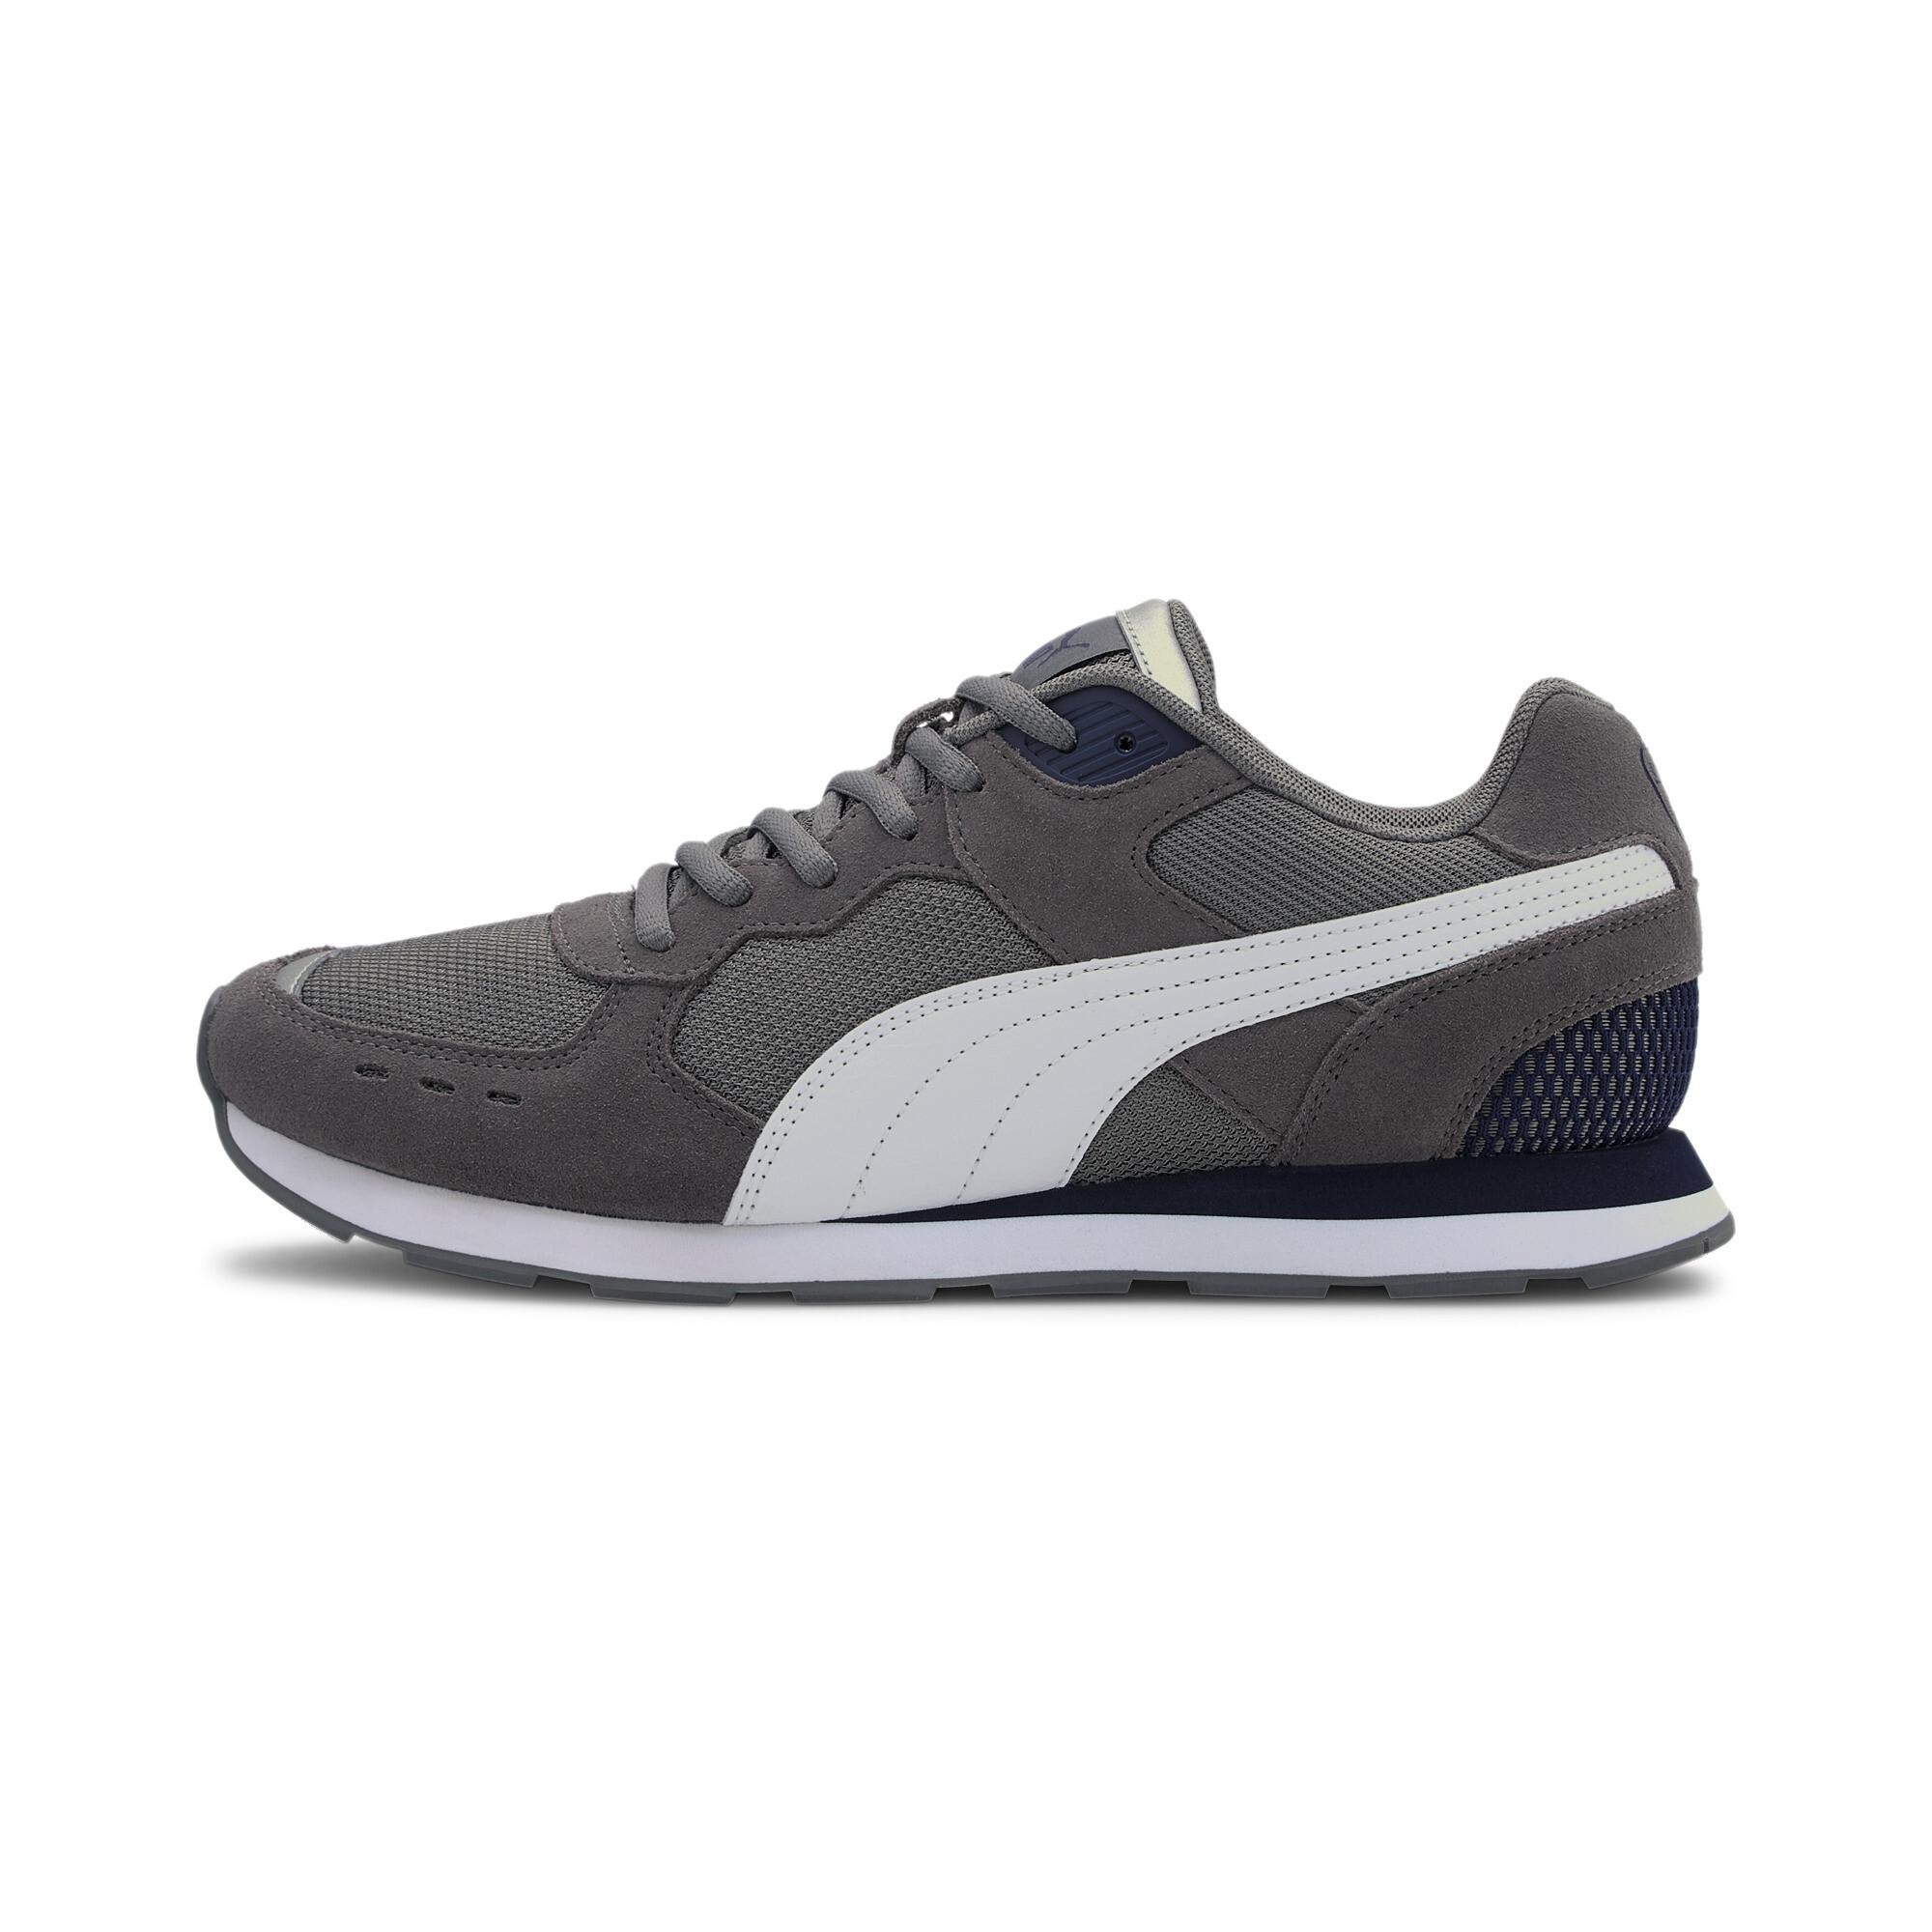 PUMA-Men-039-s-Vista-Sneakers thumbnail 46